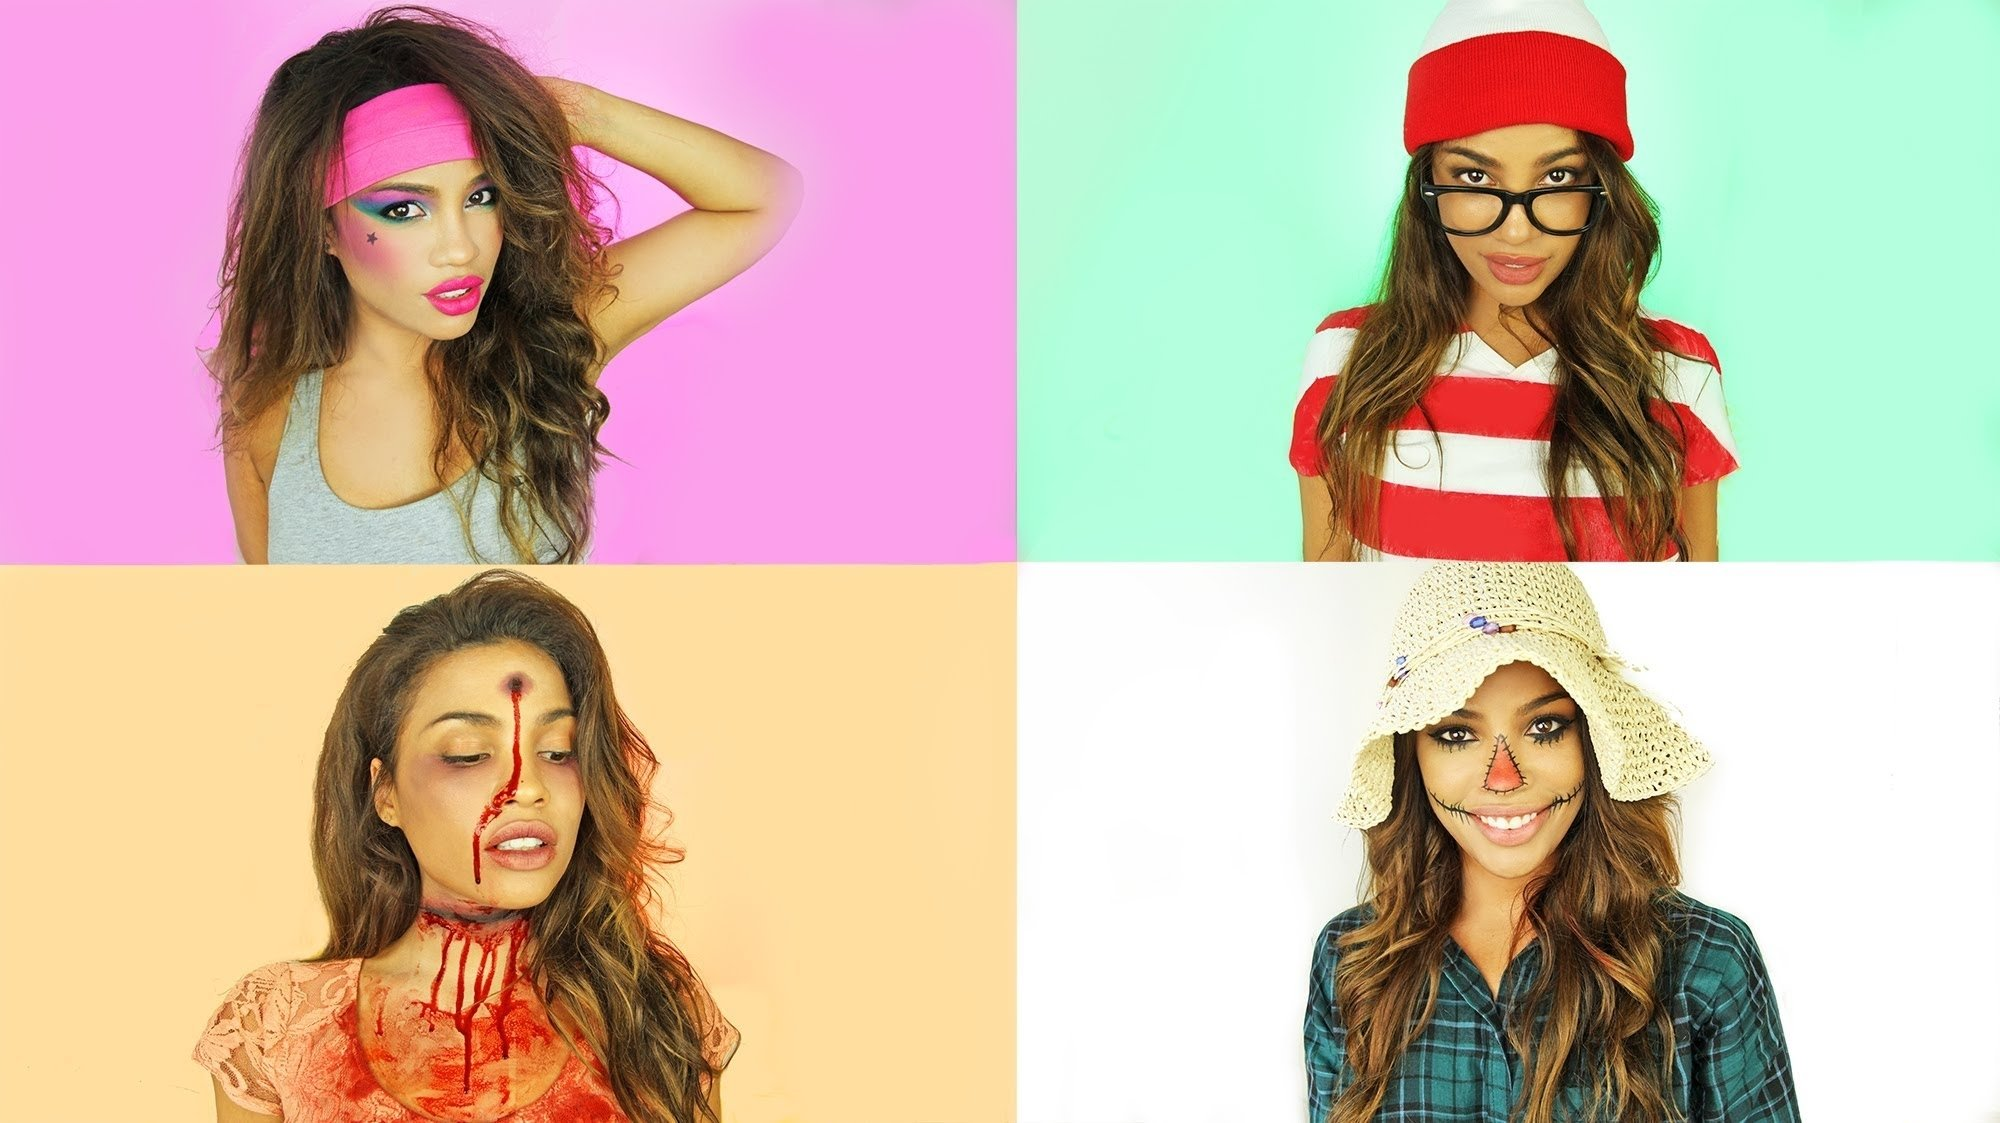 10 Wonderful Cool Halloween Costume Ideas For Girls easy diy halloween costumes ideas andreaschoice youtube 28 2020